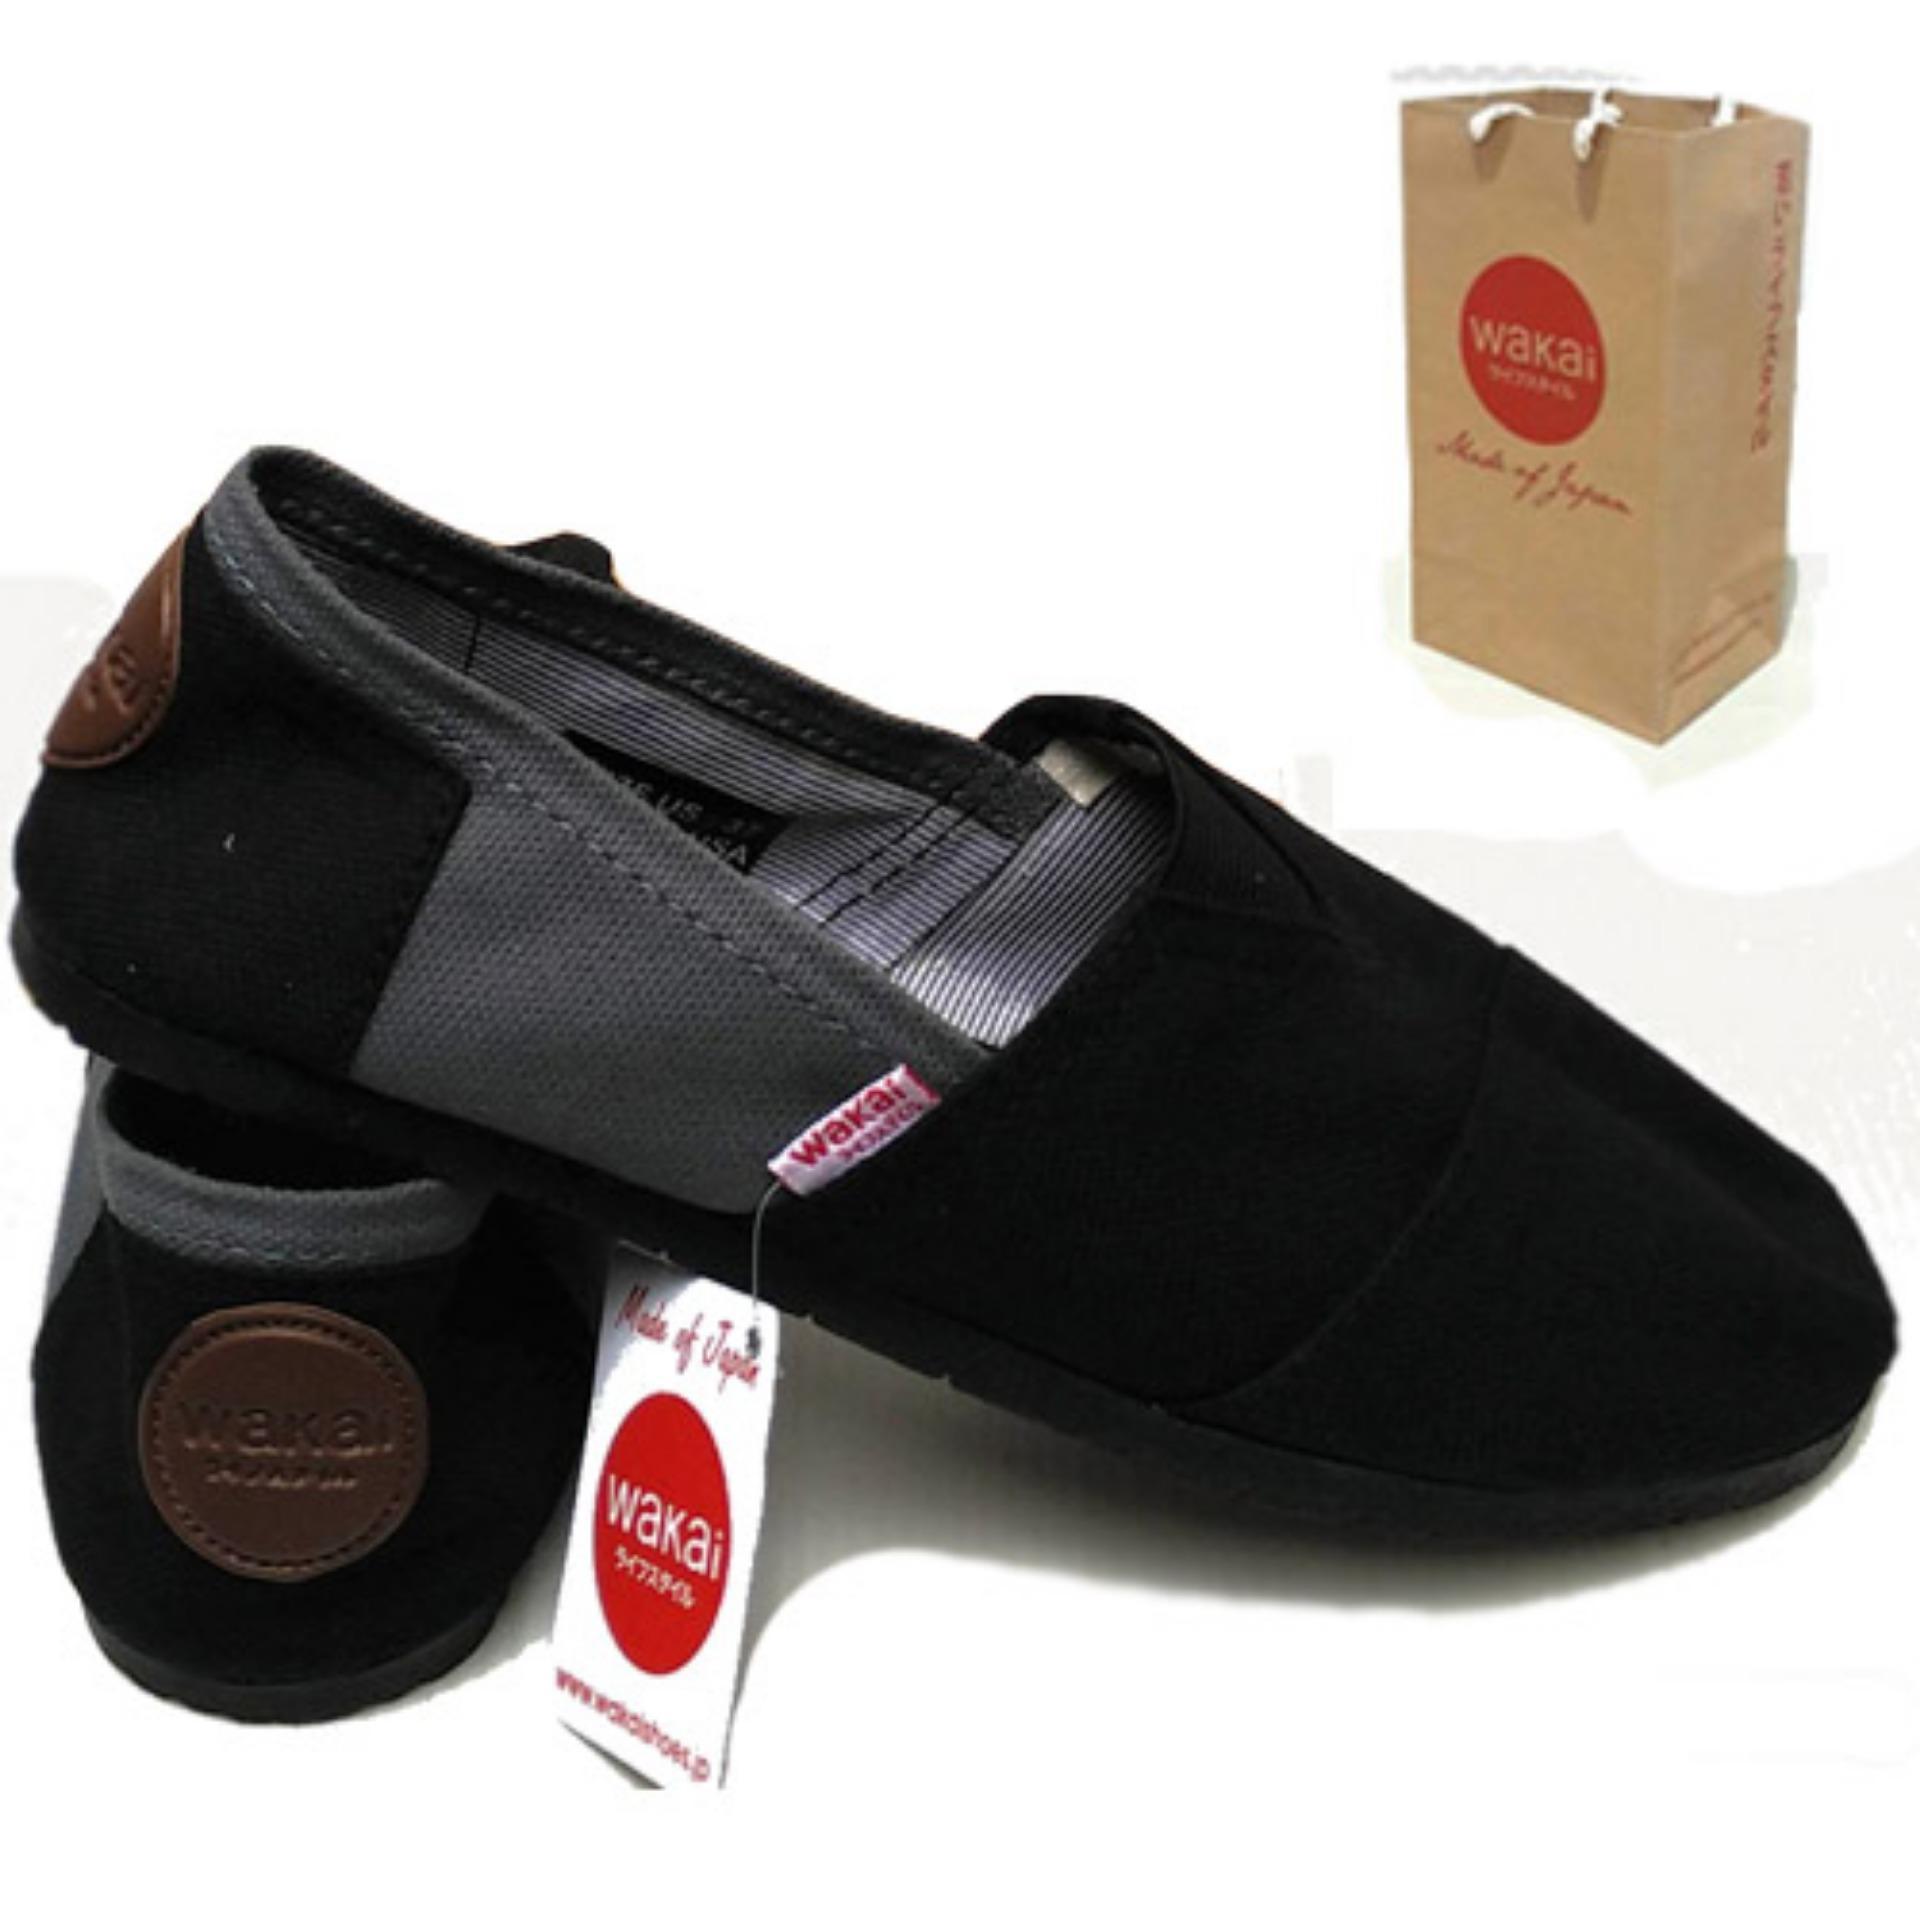 Sepatu unisex pria dan wanita wakai abu hitam, sepatu wakai pria slip on loafer sepatu wanita wakai